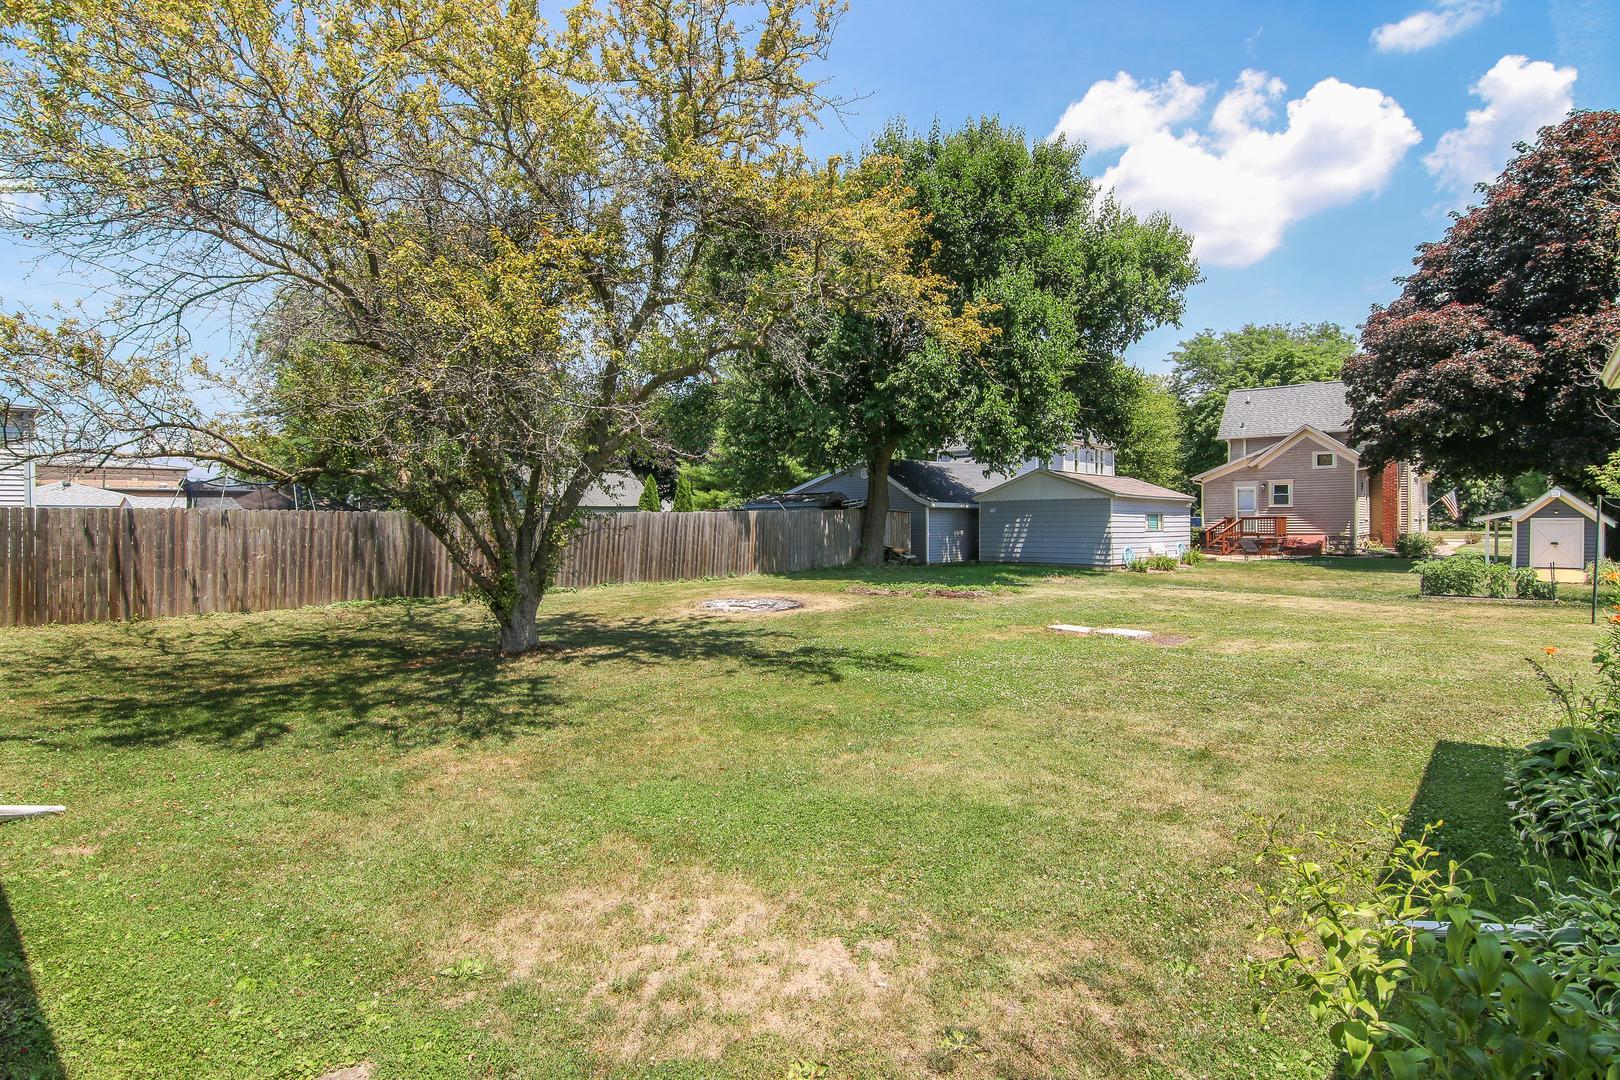 255 North Liberty, Leland, Illinois, 60531